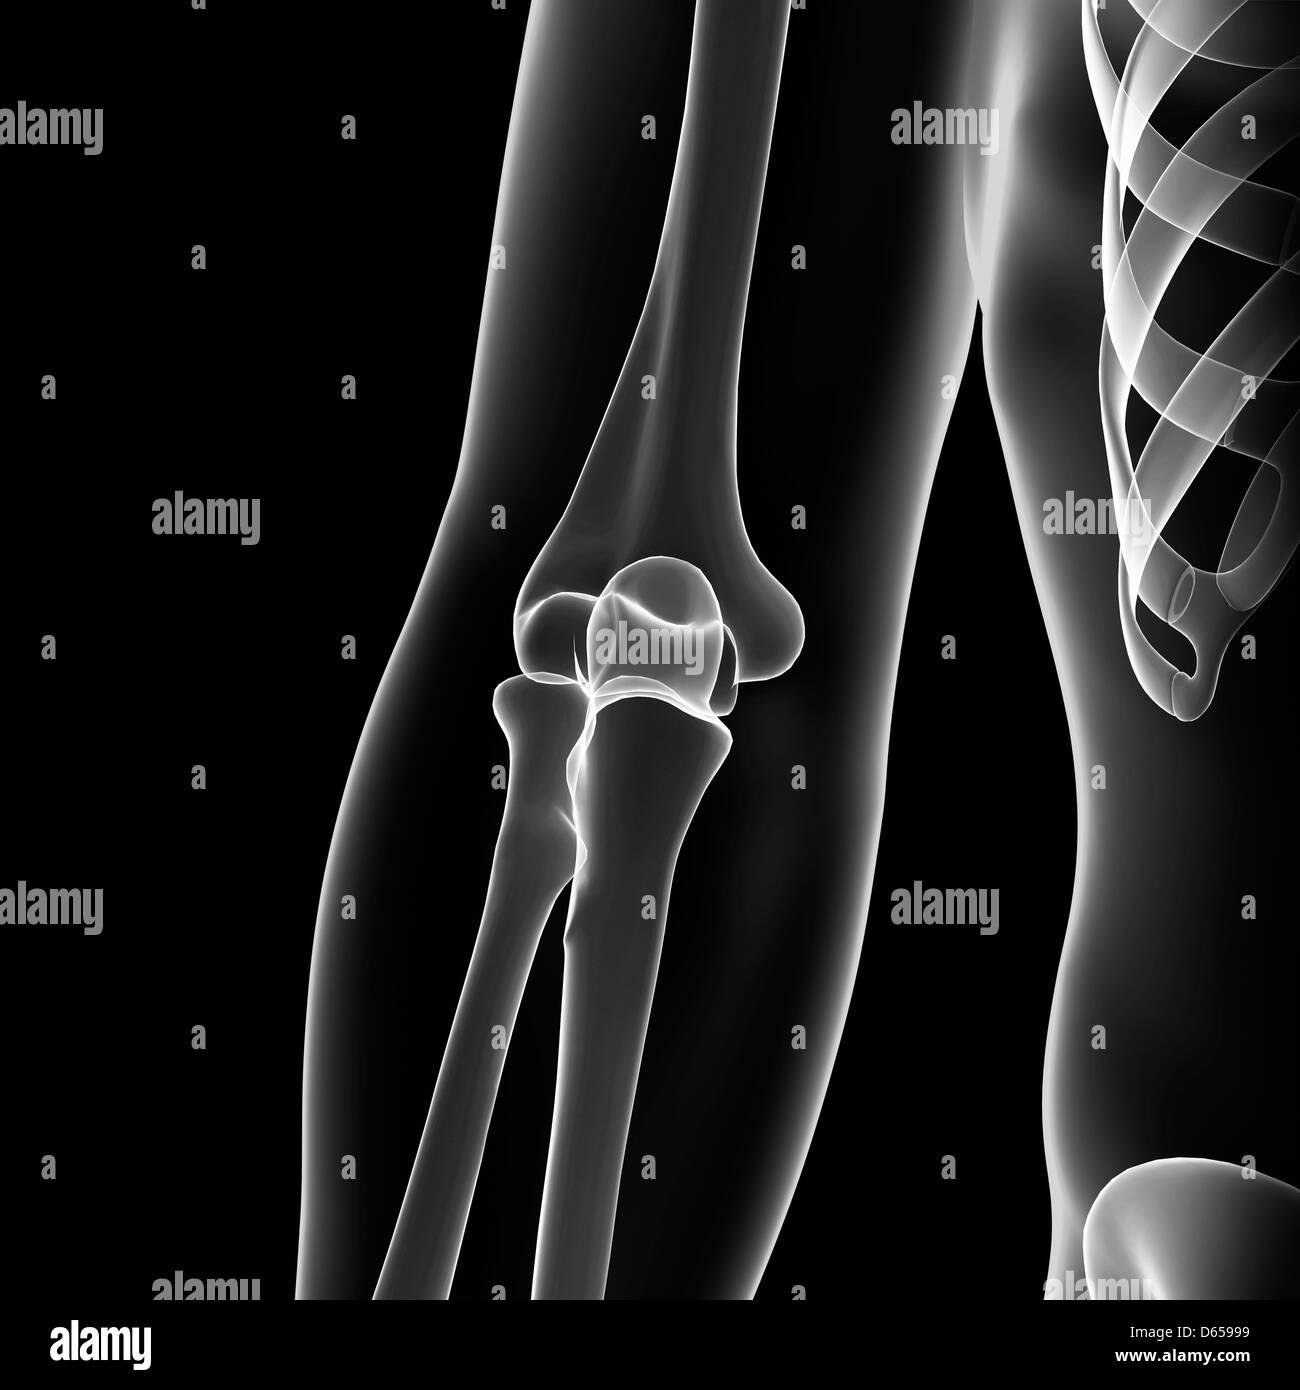 Elbow Bone Stock Photos Elbow Bone Stock Images Alamy